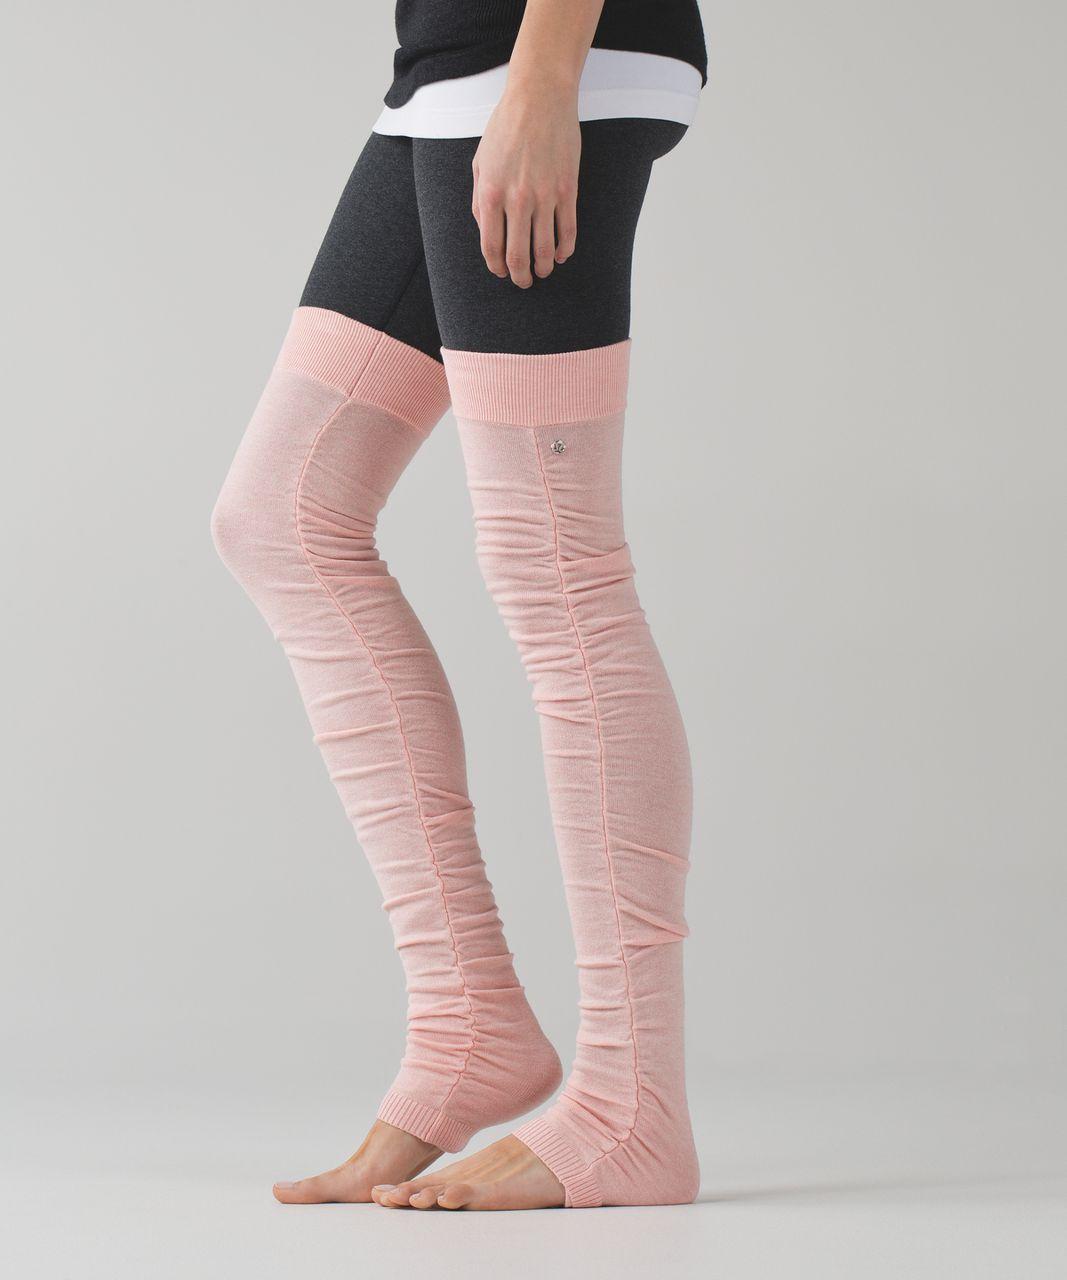 Lululemon Sheer Bliss Leg Warmer - Heathered Minty Pink